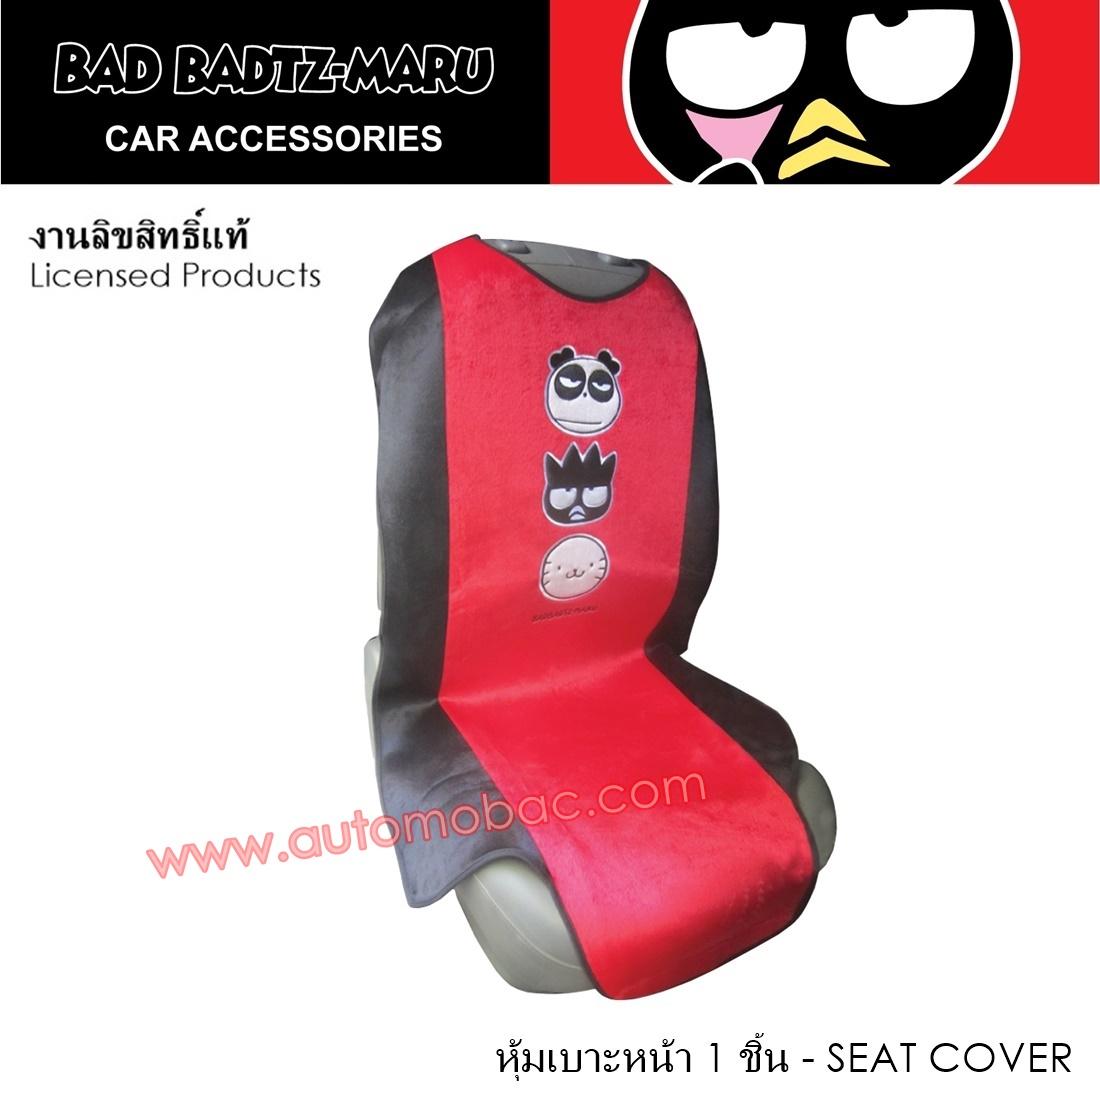 BAD BADTZ-MARU ที่หุ้มเบาะเต็มตัว ปกป้องเบาะรถจากความร้อน รอยขีดข่วน กันเปื้อน กันสิ่งสกปรก